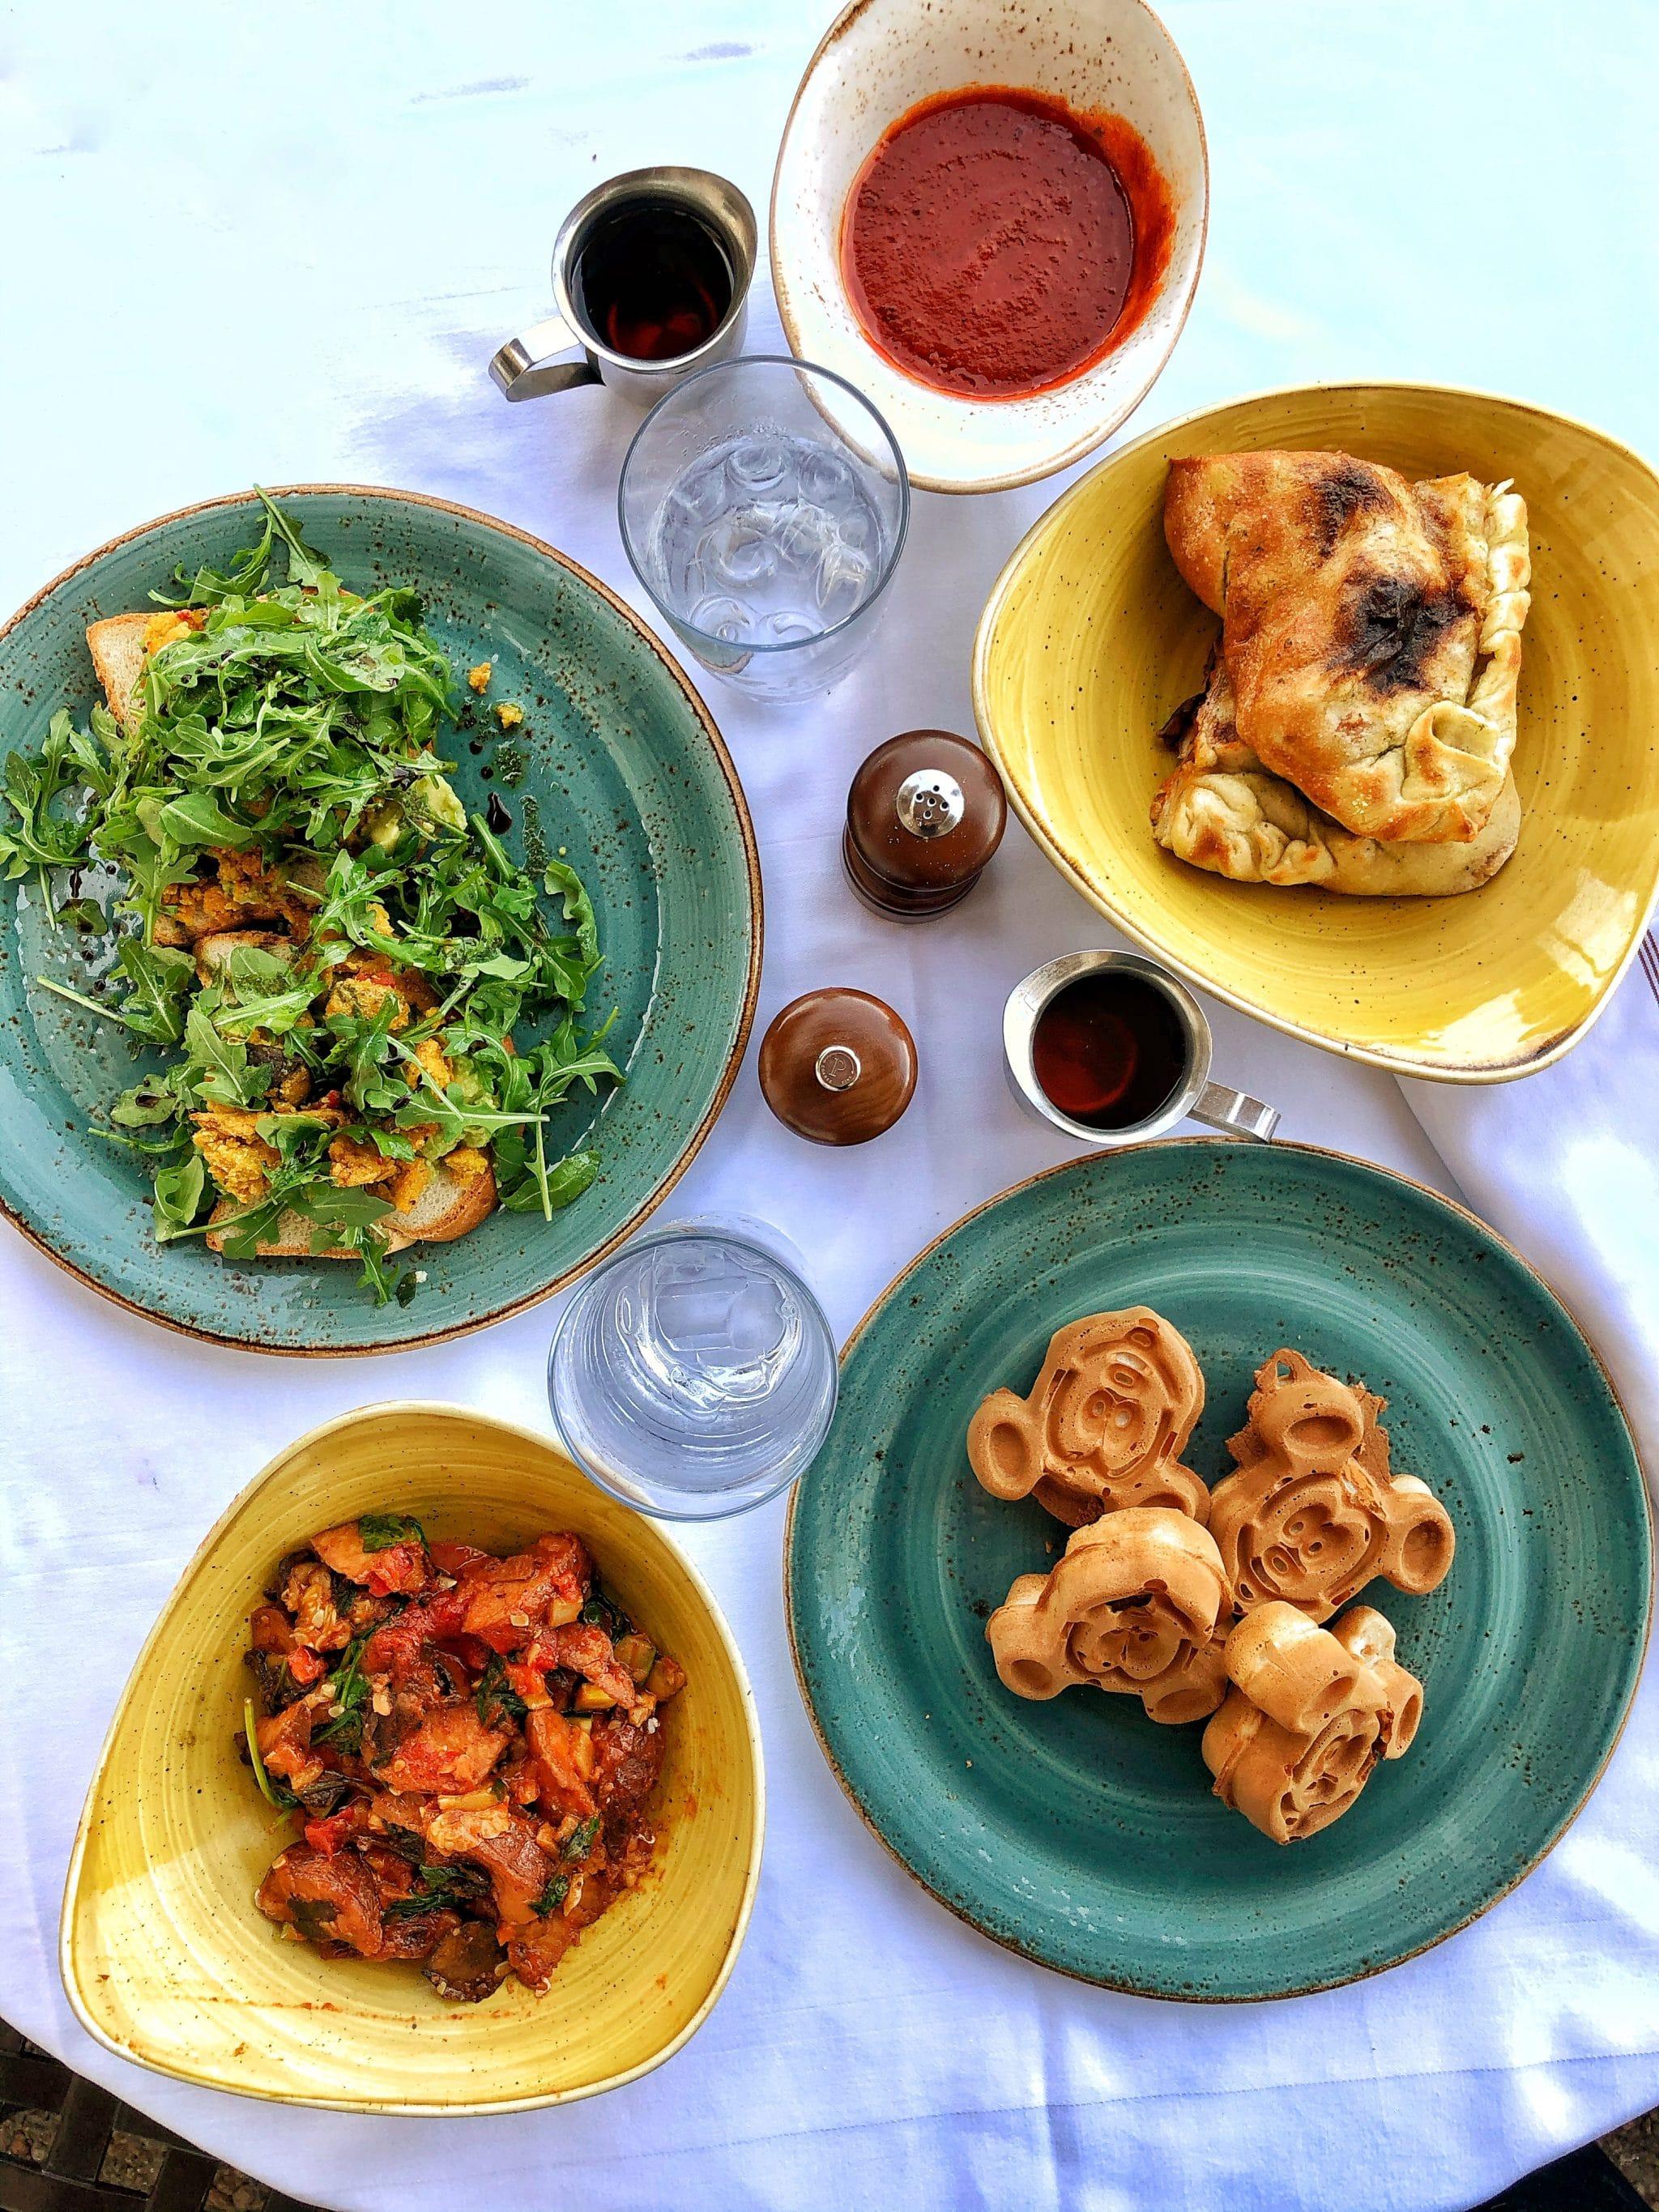 Vegan Breakfast Review at Trattoria al Forno on the Disney Boardwalk at Walt Disney World